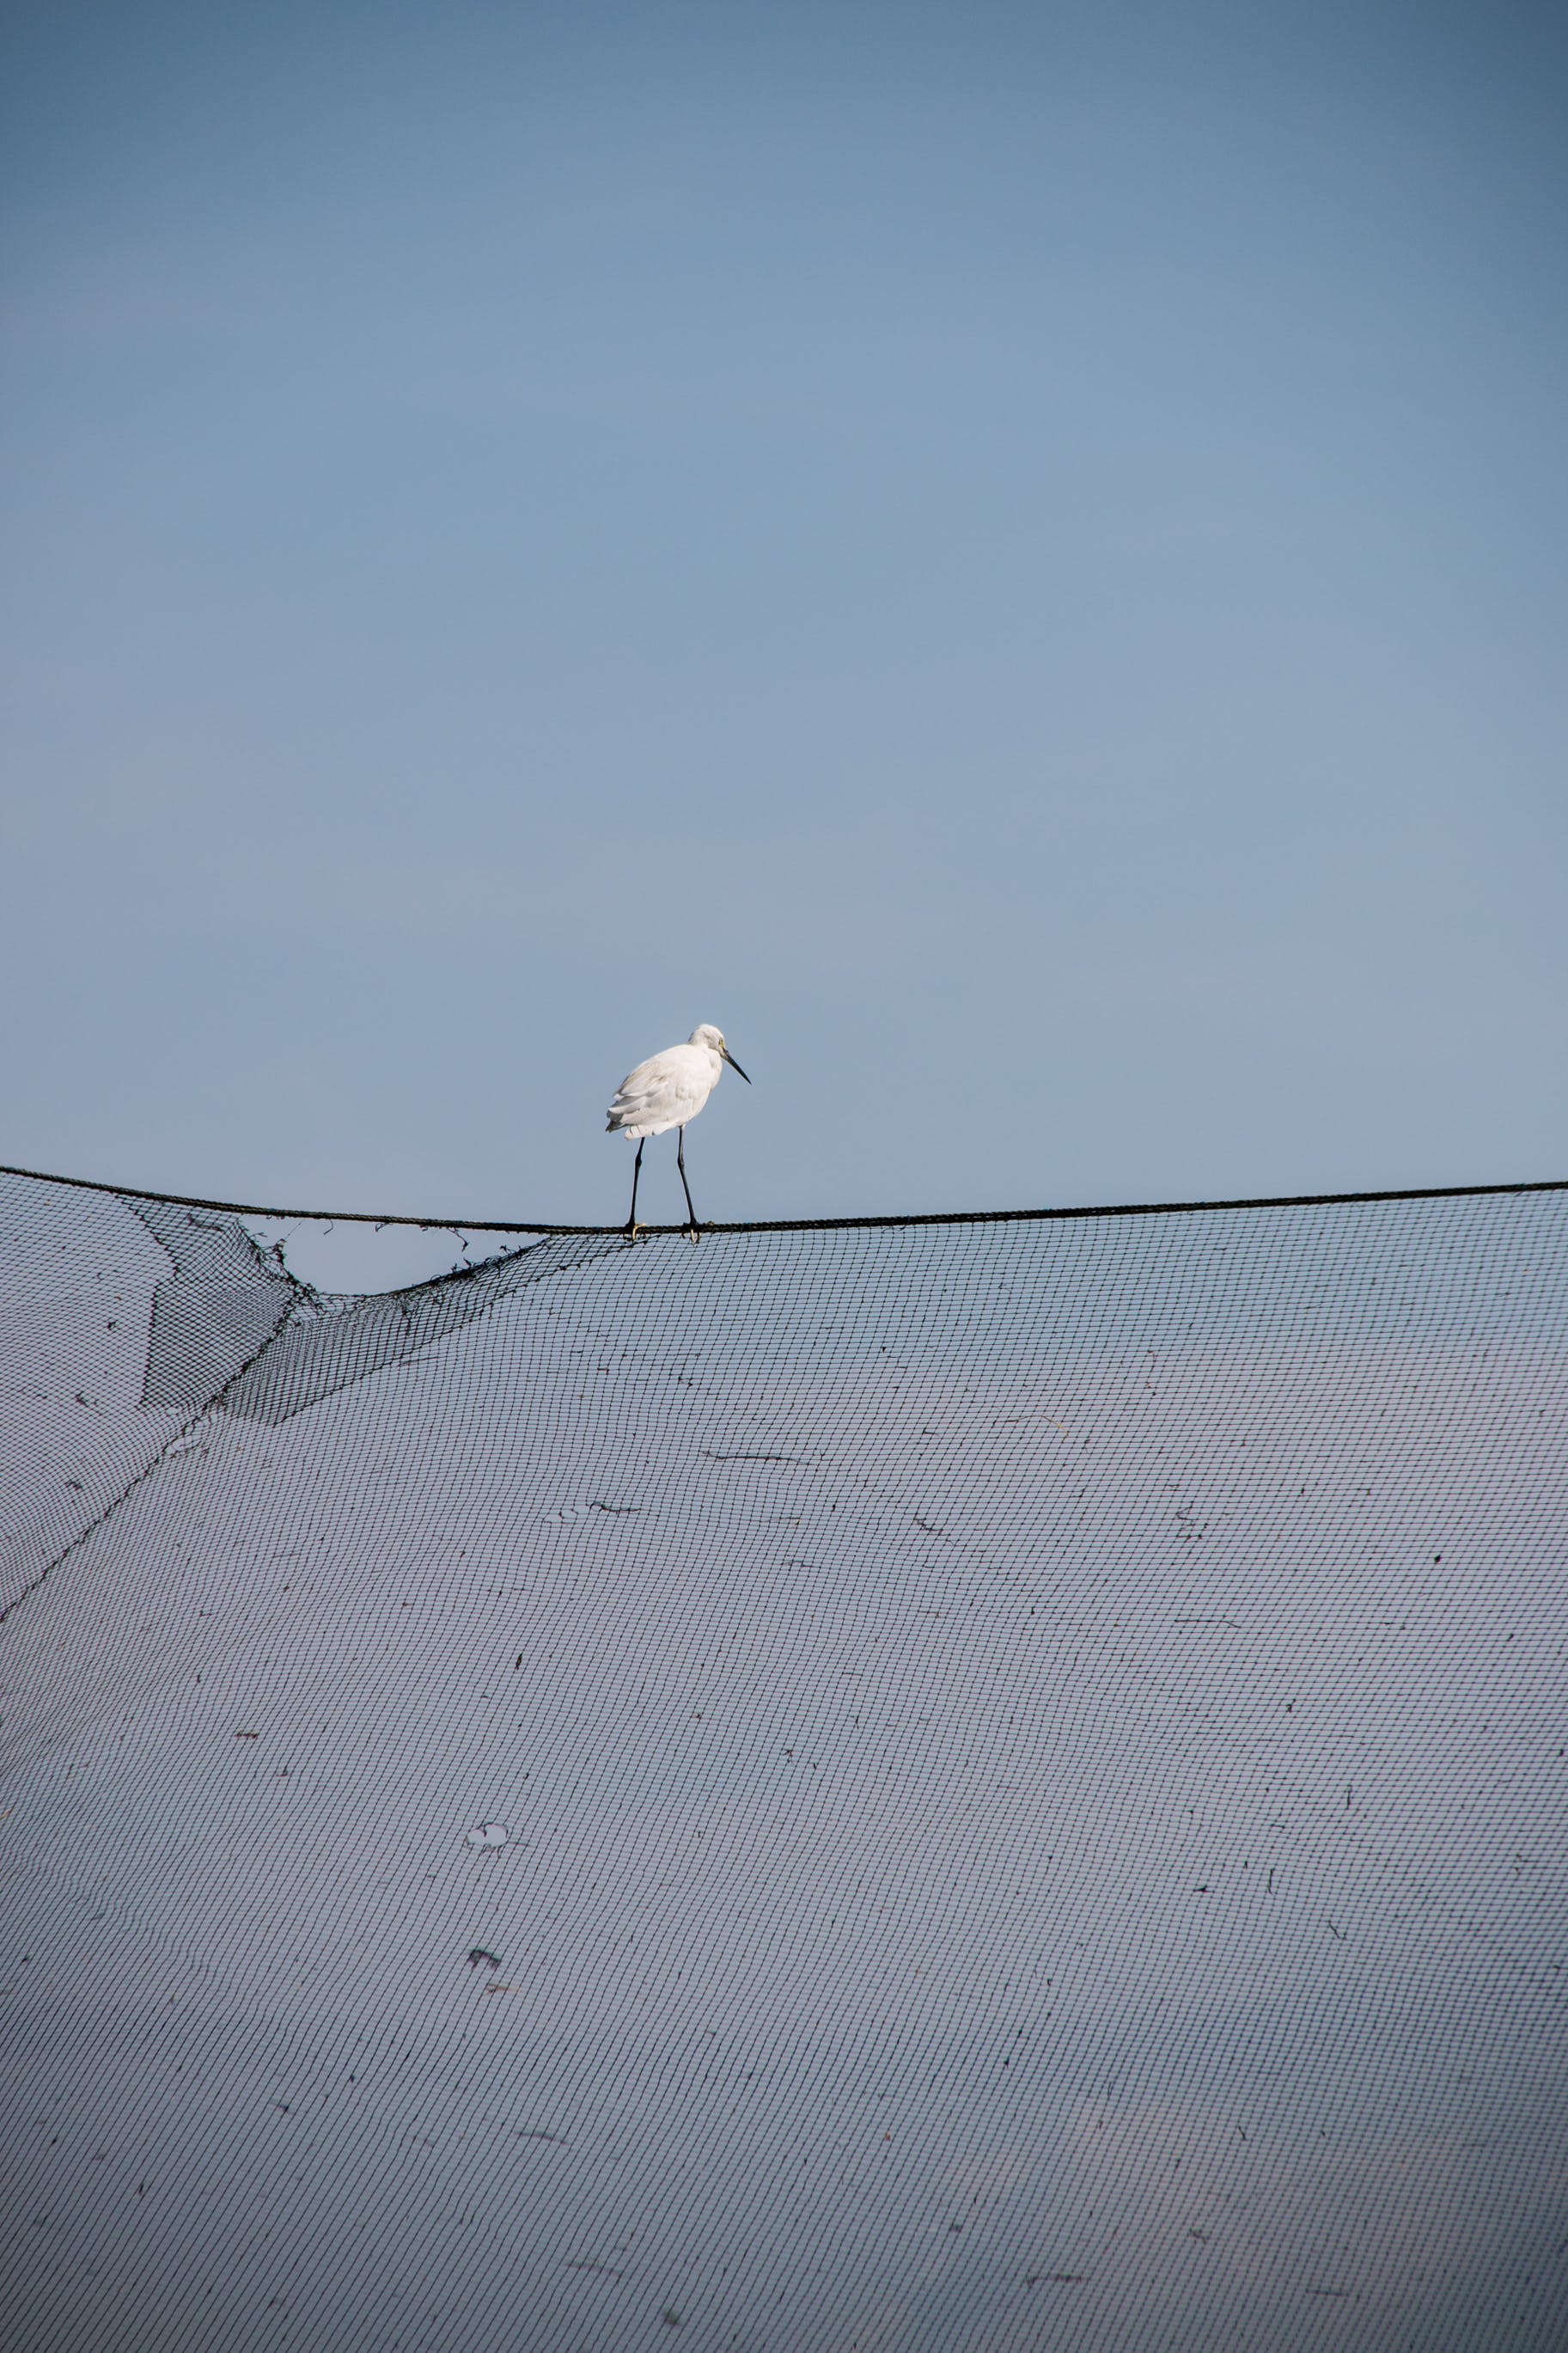 Free stock photo of #fishingnet #bird #sky